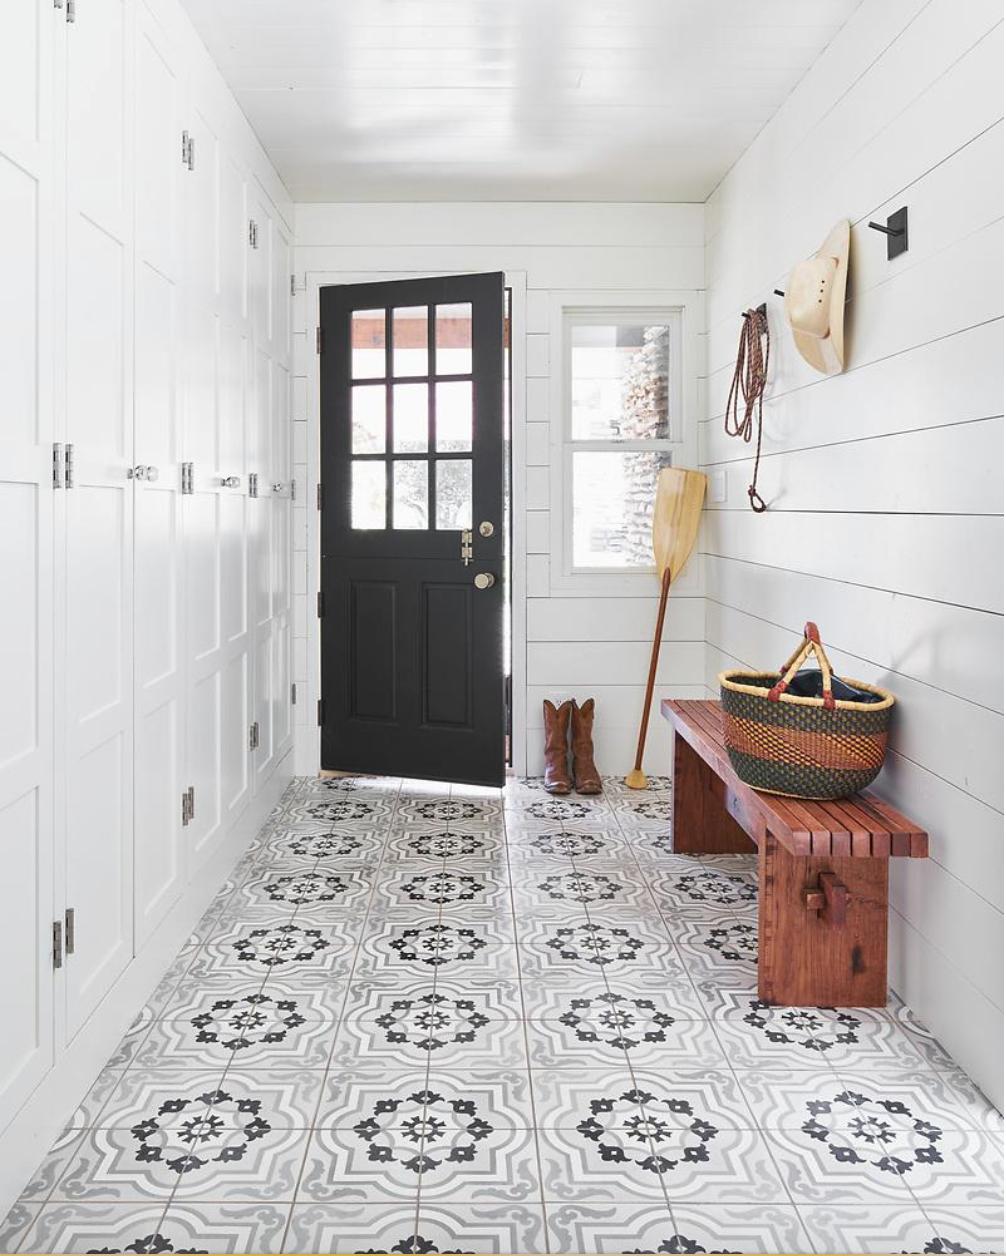 London Apothecary 8 X8 X5 8 Tile White Shiplap Wall Mudroom Flooring Flooring